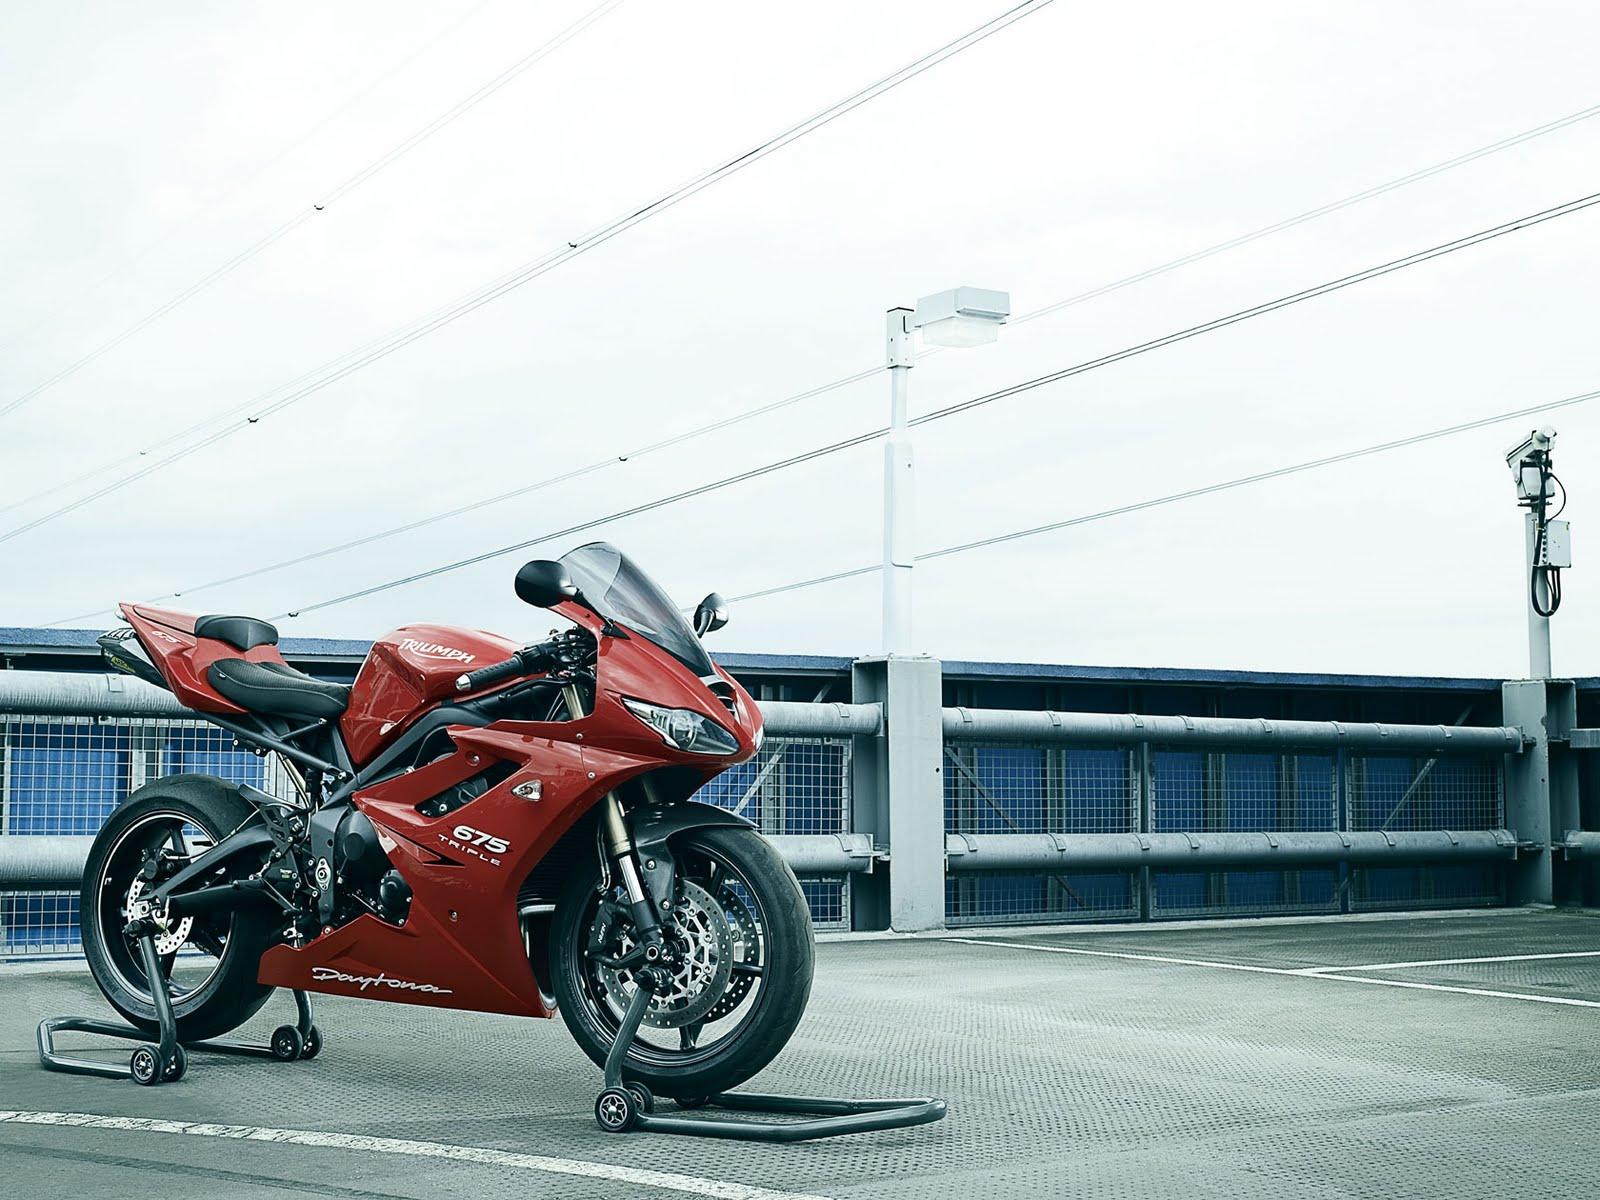 http://4.bp.blogspot.com/_FpGcbrYTyDw/S78_fLsCZ3I/AAAAAAAAAdY/-Rh9-VaEvDM/s1600/2010+Triumph+Daytona+675.jpg